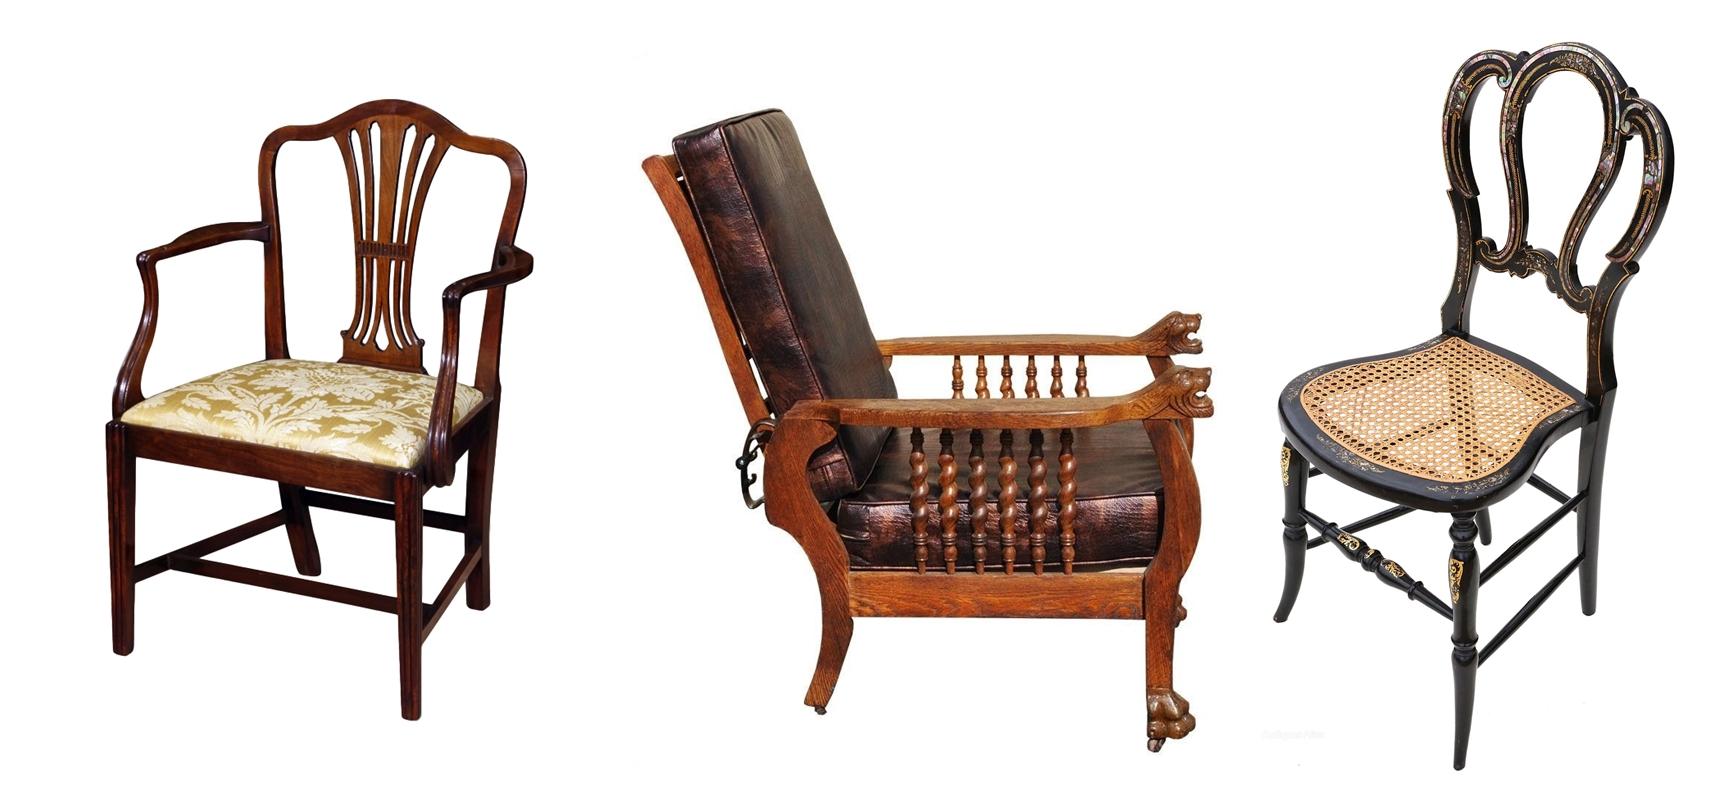 Terrific Chair Restoration Products Supplies Machost Co Dining Chair Design Ideas Machostcouk